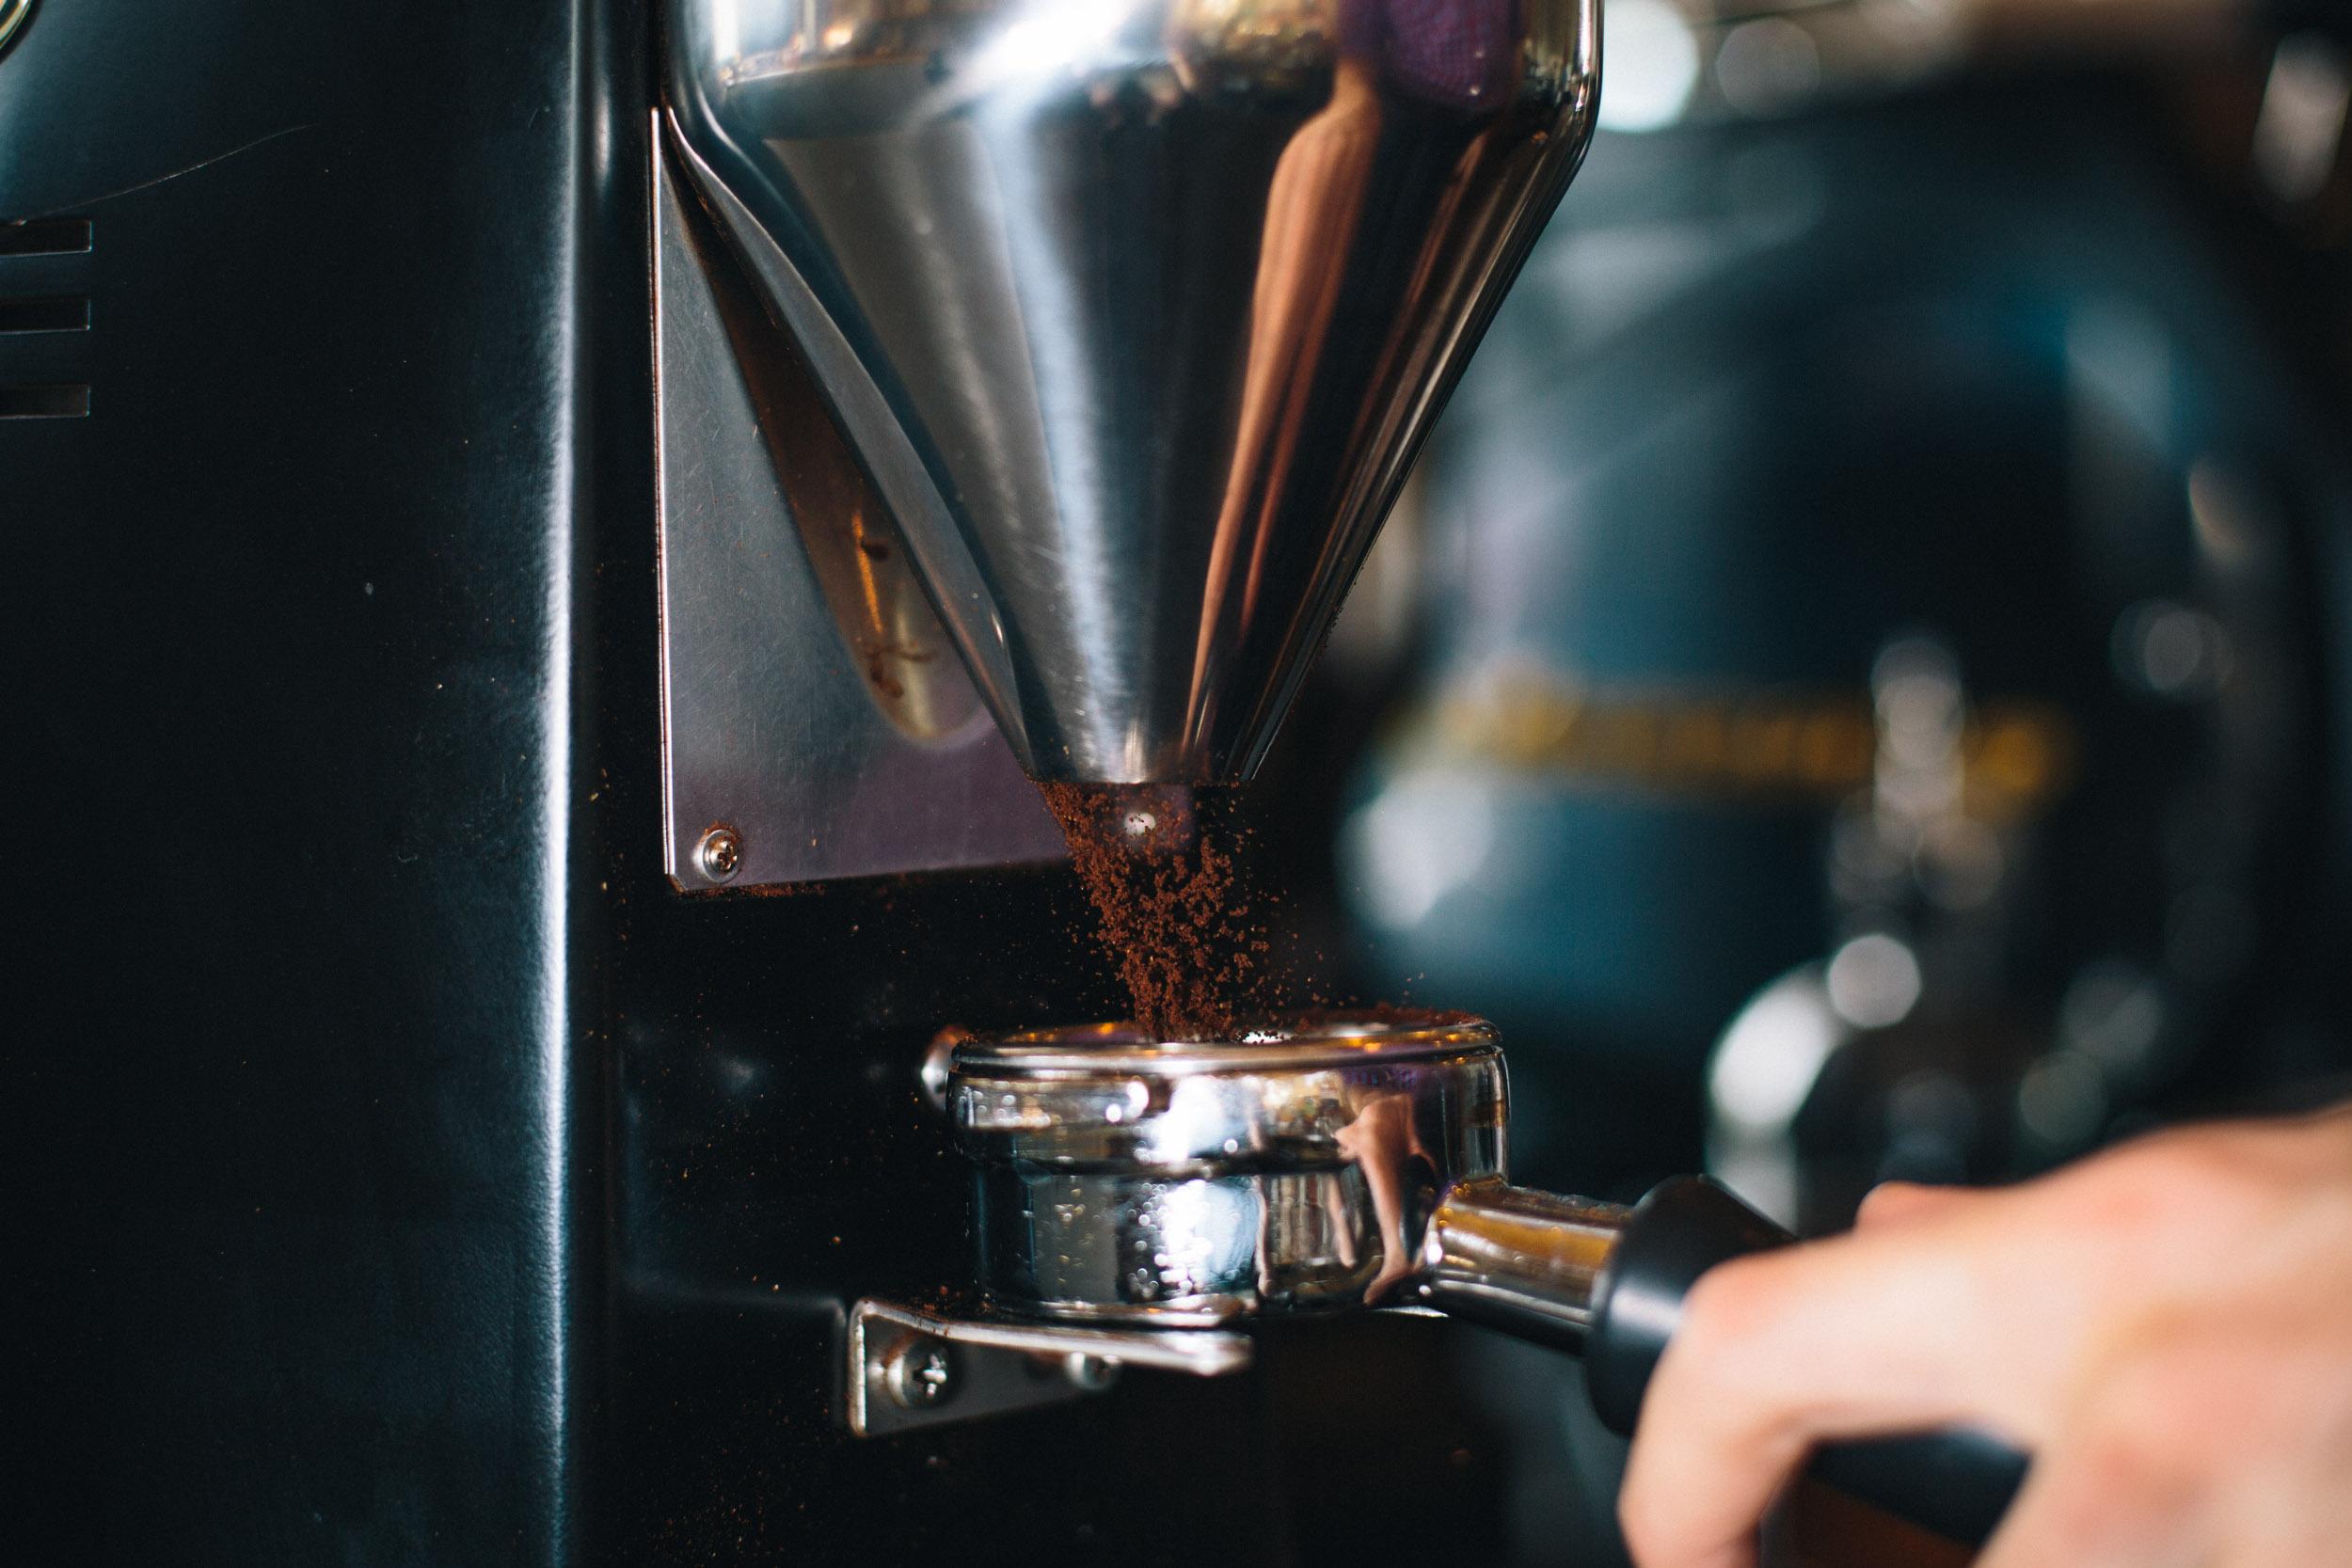 jimmy-rowalt-atlanta-coffee-food-drink-photography-040.jpg